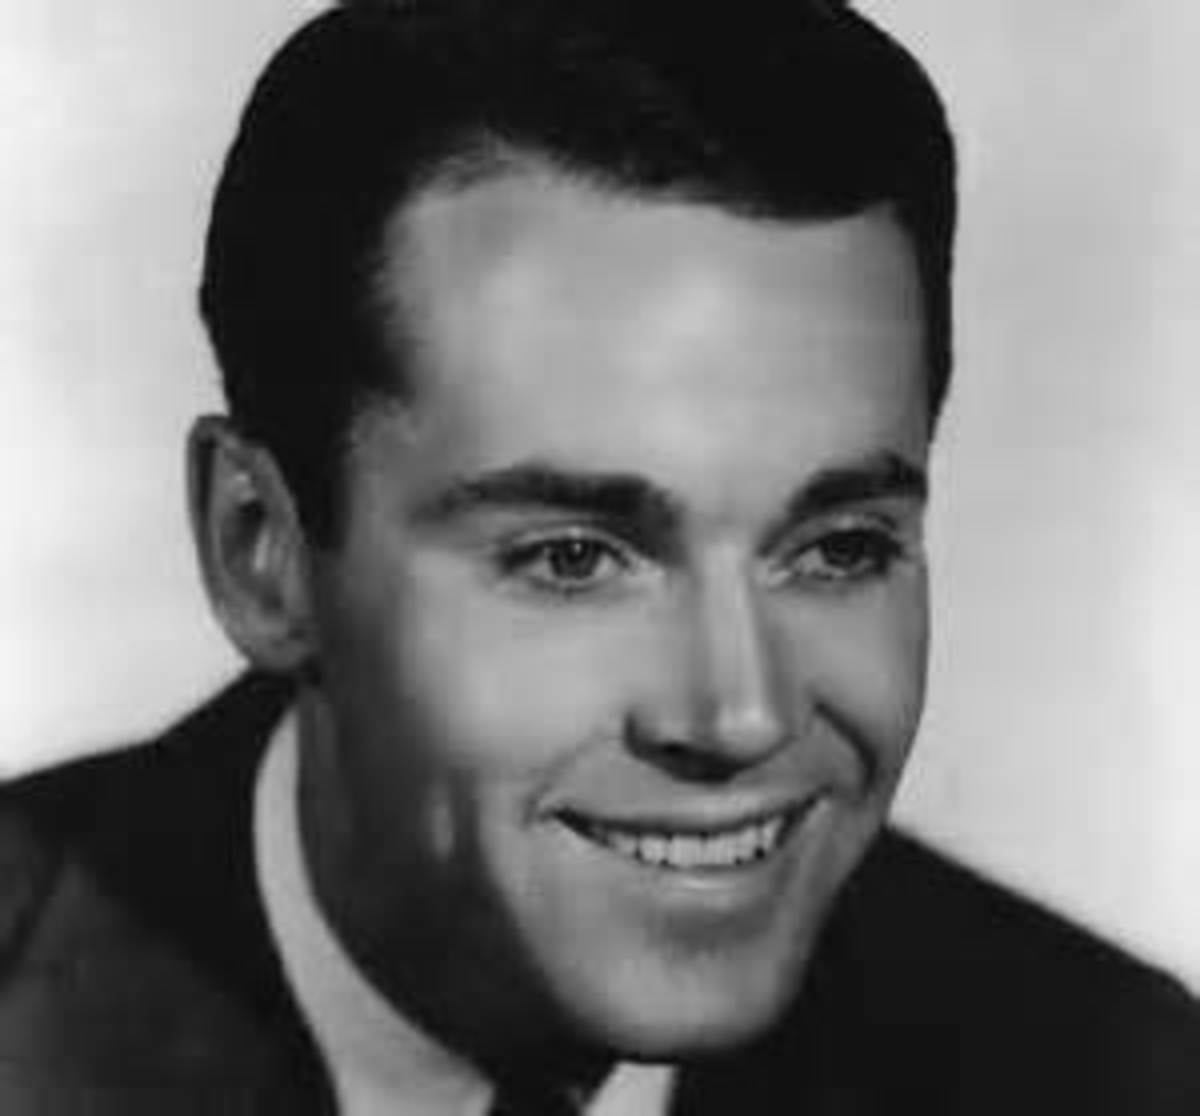 Henry Fonda